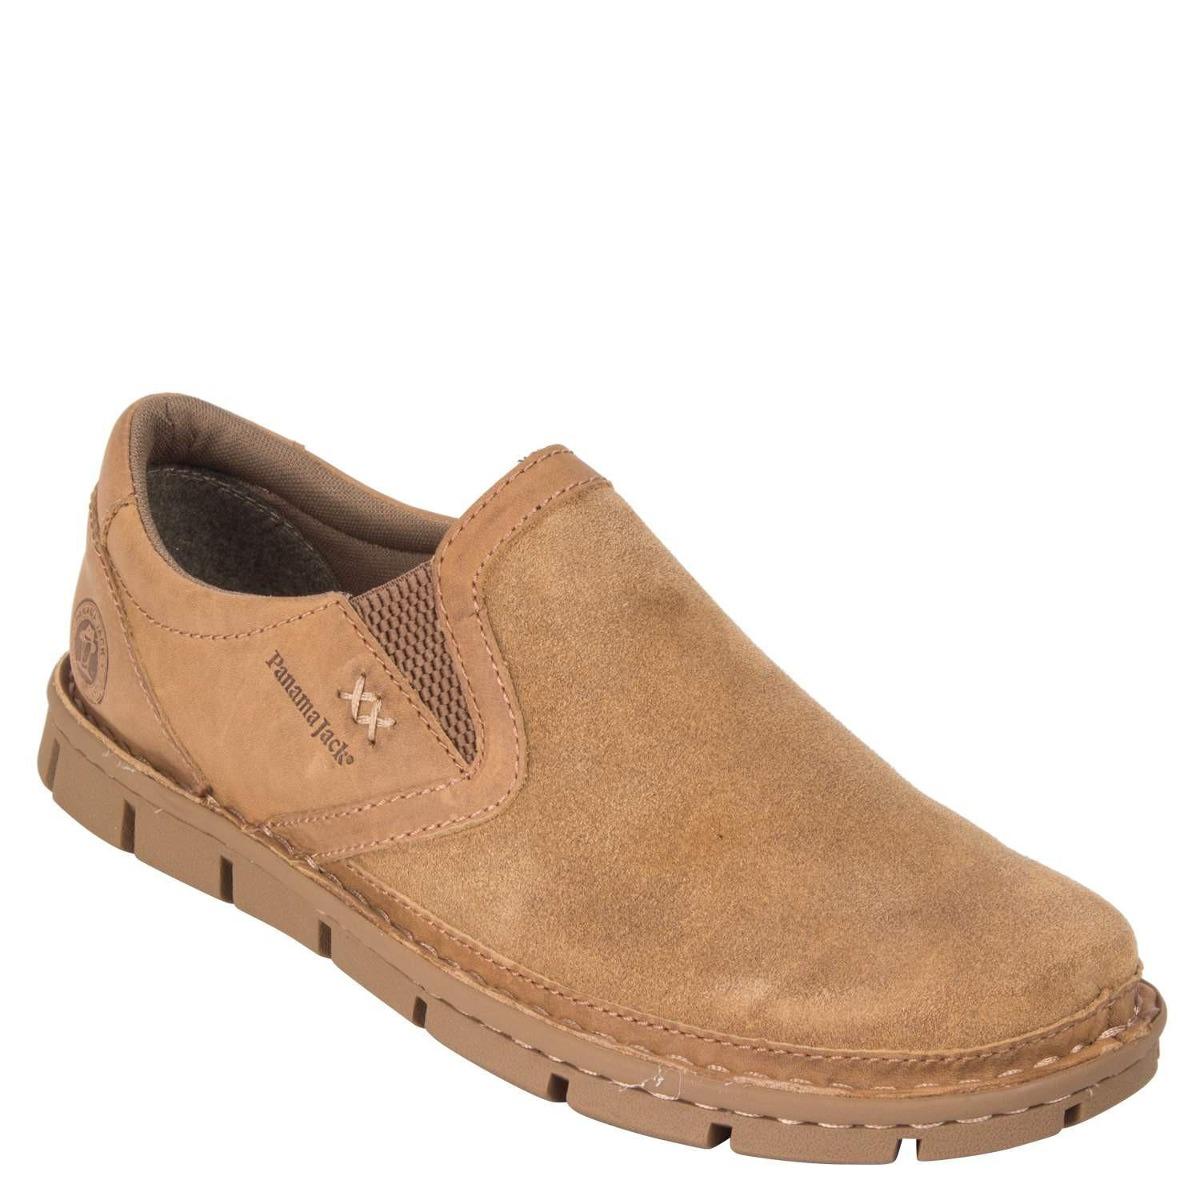 código promocional 0fe39 294ae Zapato Mont Blanc Panama Jack Hombre Camel - S375